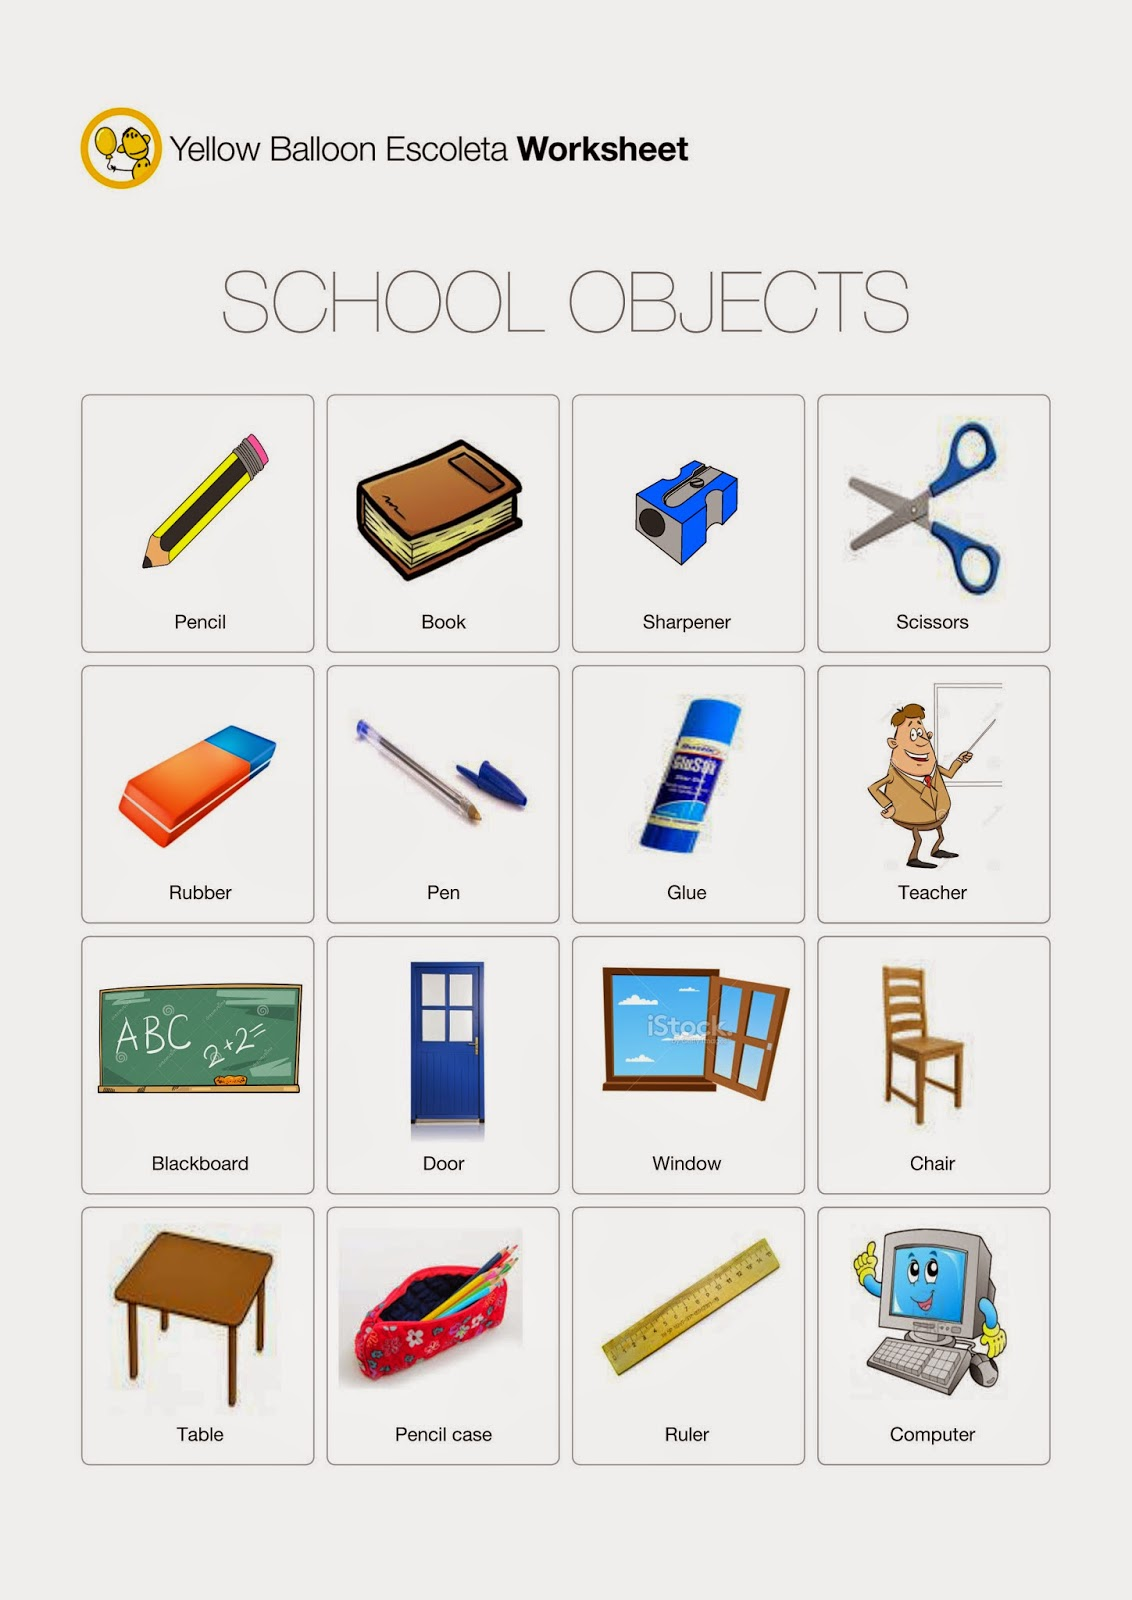 Yellow Balloon Escoleta: SCHOOL OBJECTS Worksheet